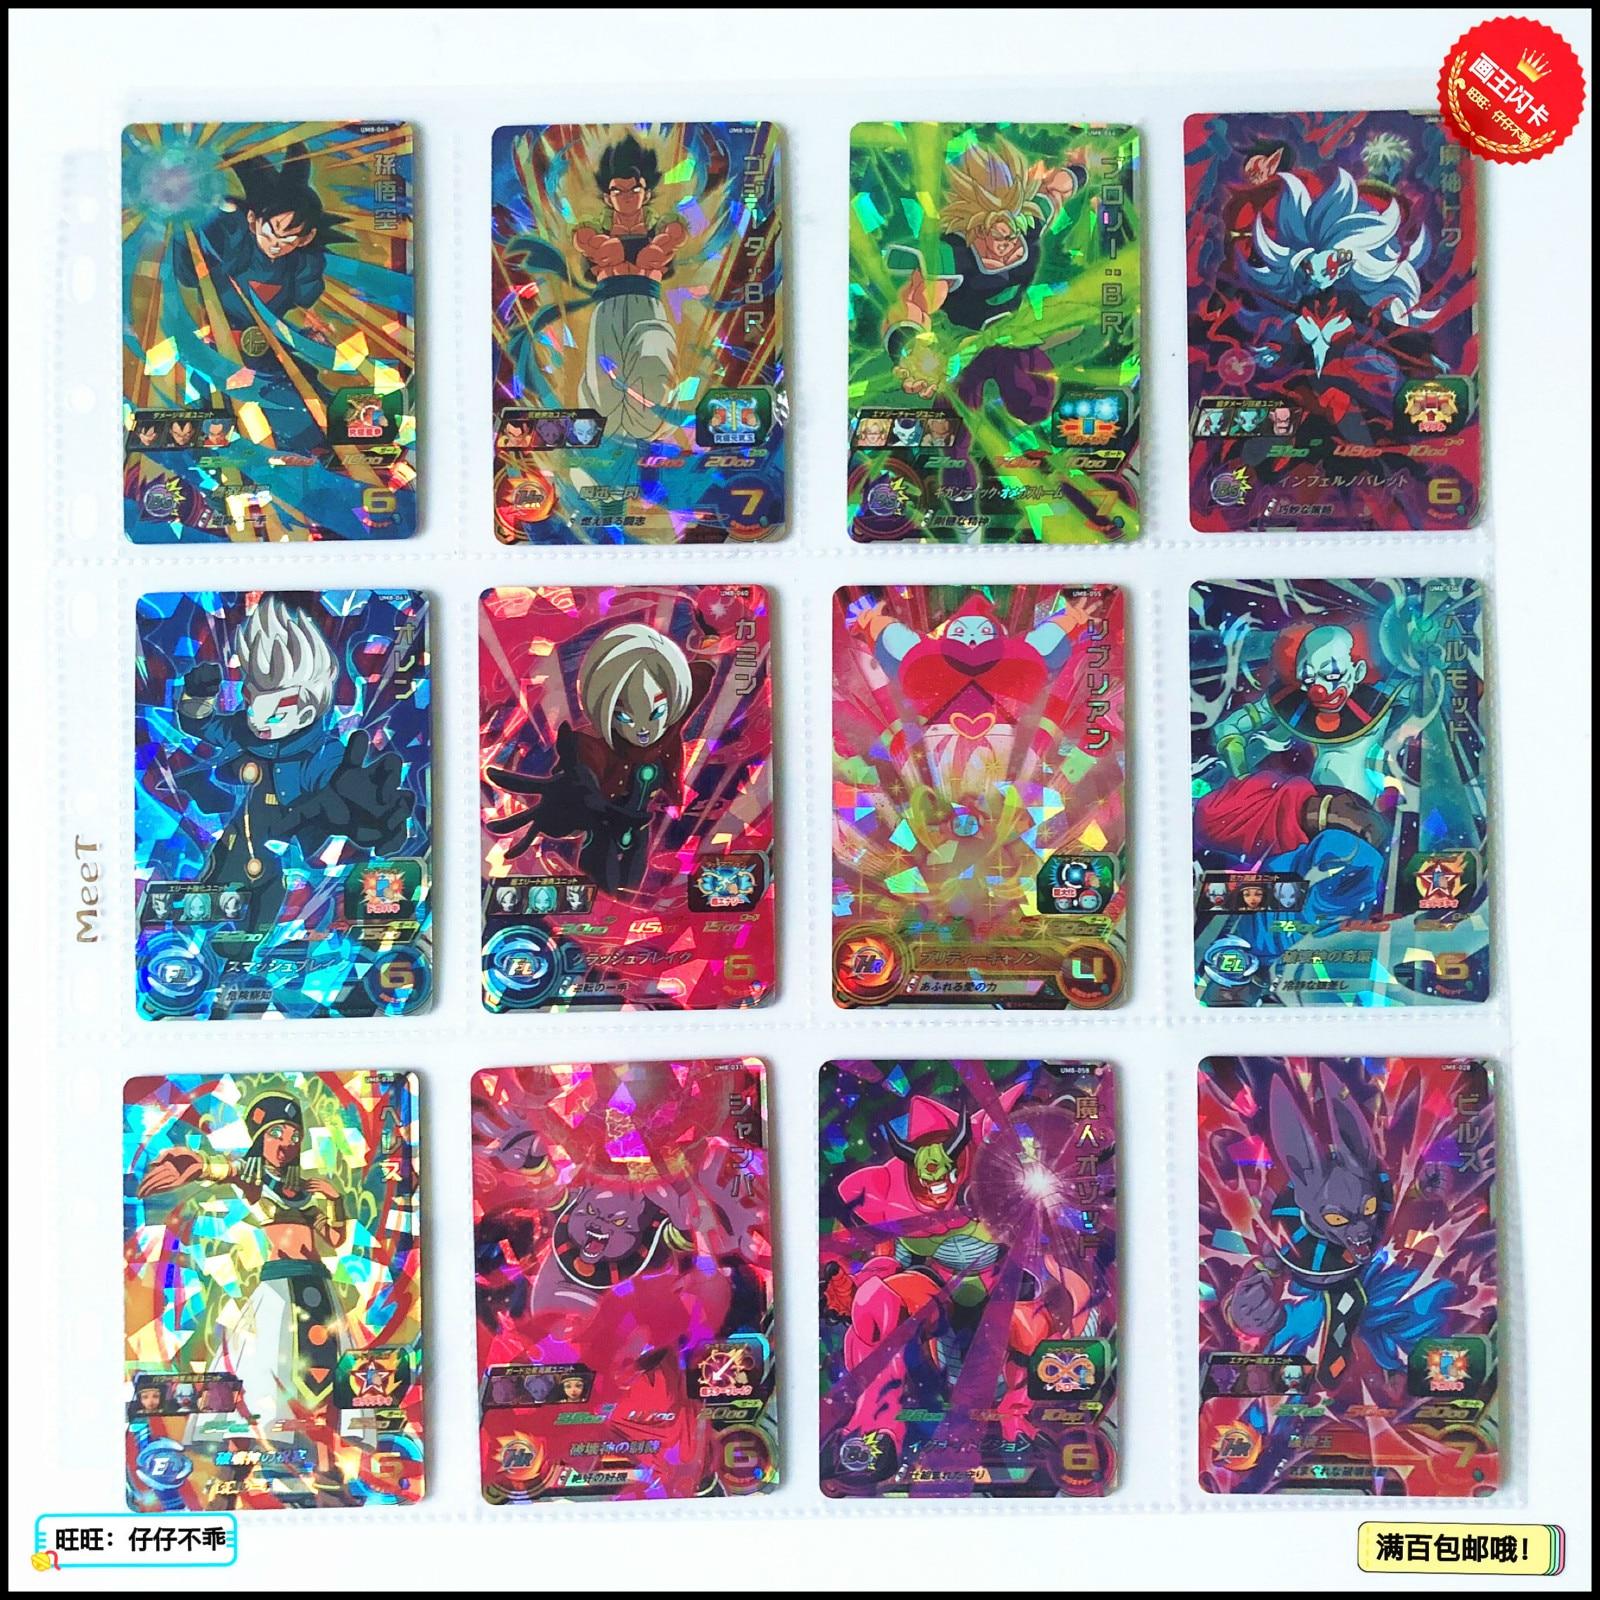 Japan Original Dragon Ball Hero Card 3 Stars UM8 SR Goku Toys Hobbies Collectibles Game Collection Anime Cards